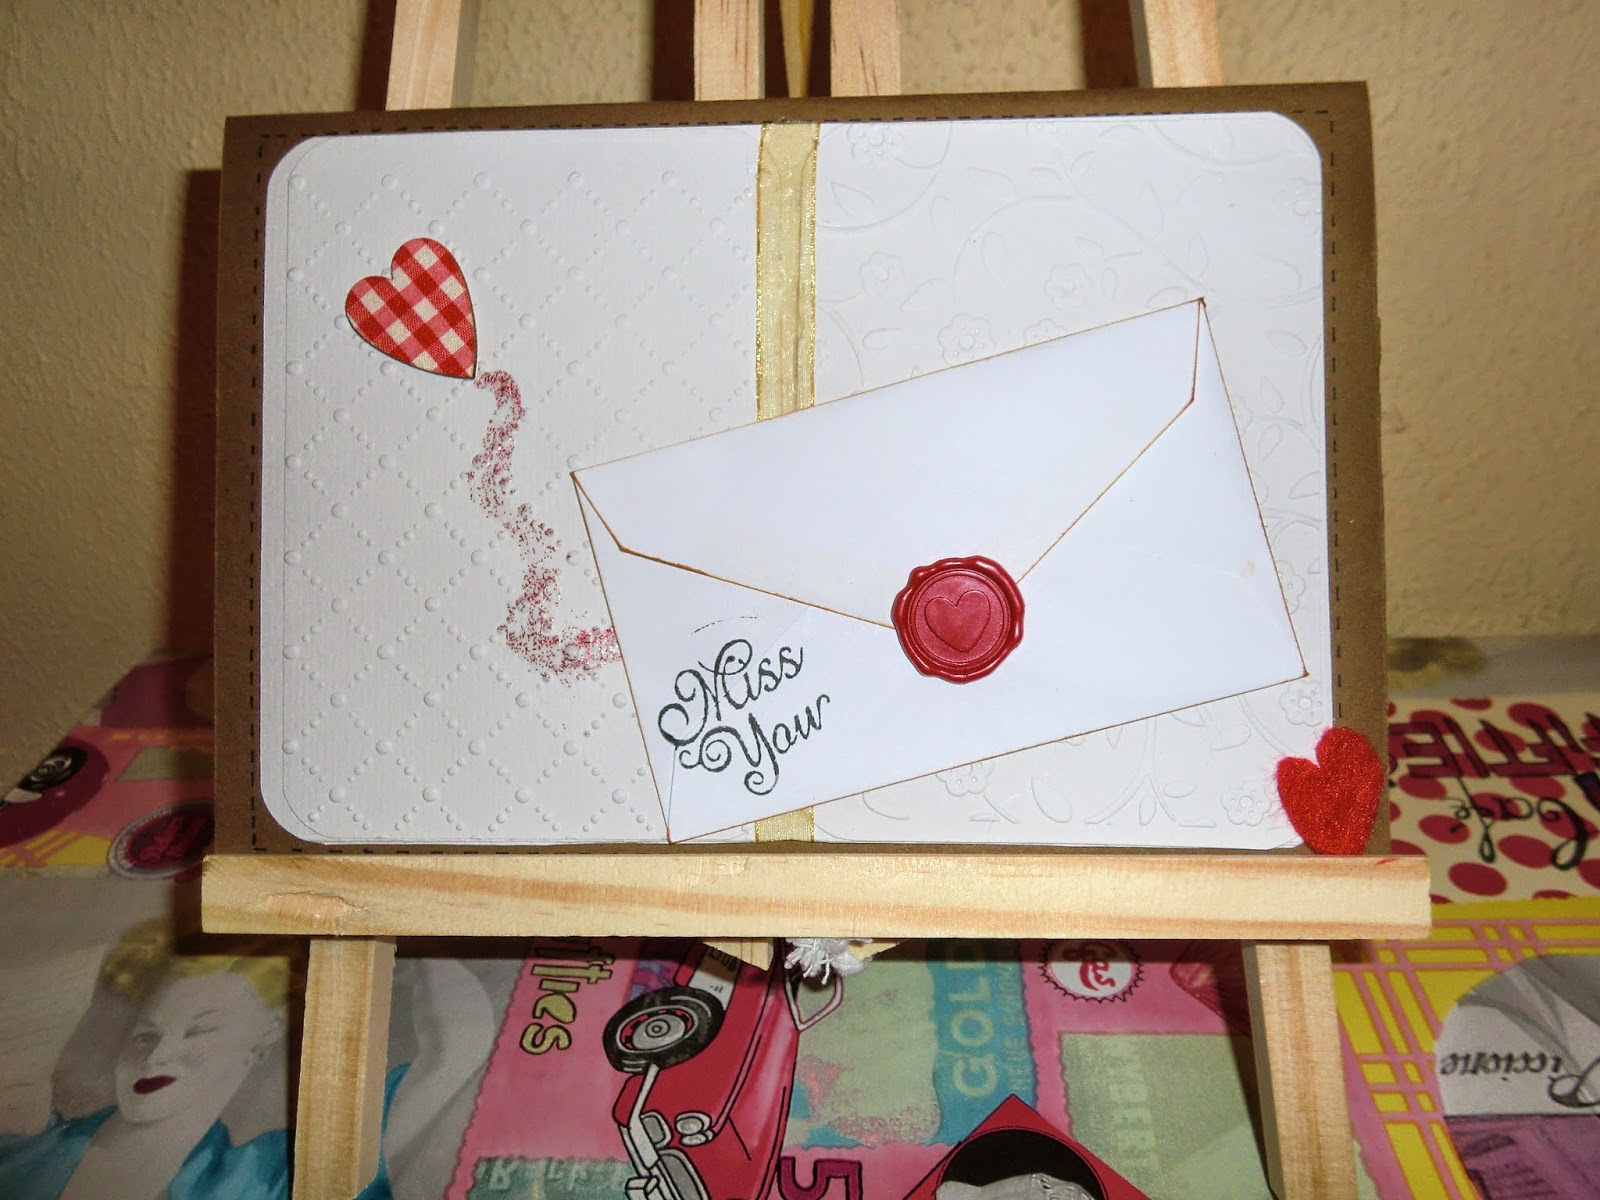 Primer plano de tarjeta Miss you